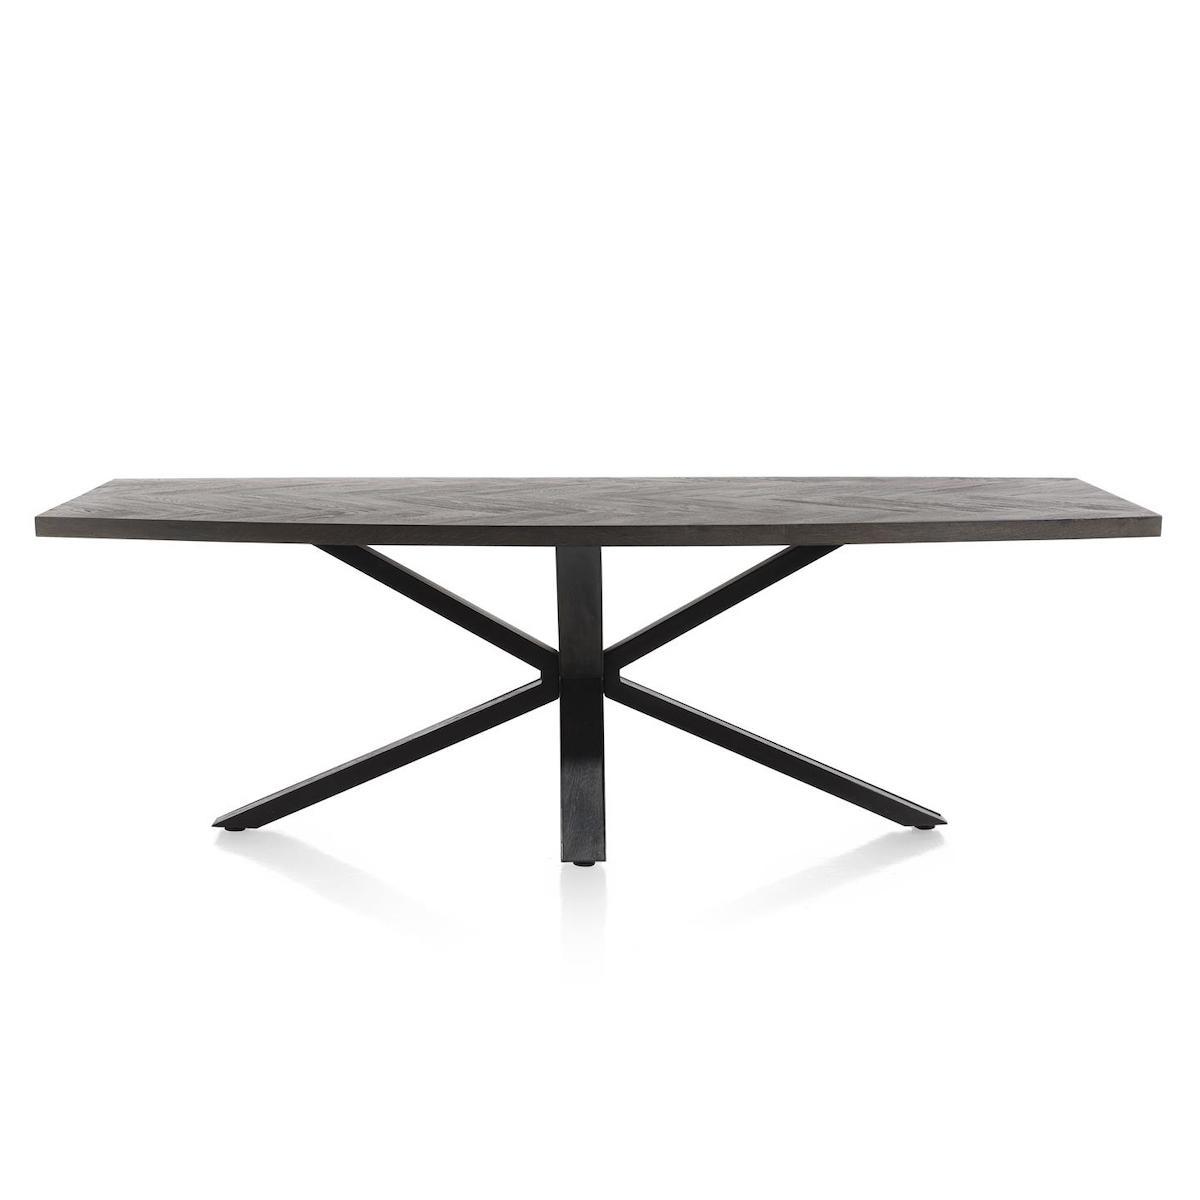 Table ovale 240x110cm METALUXE Henders & Hazel castle anthracite